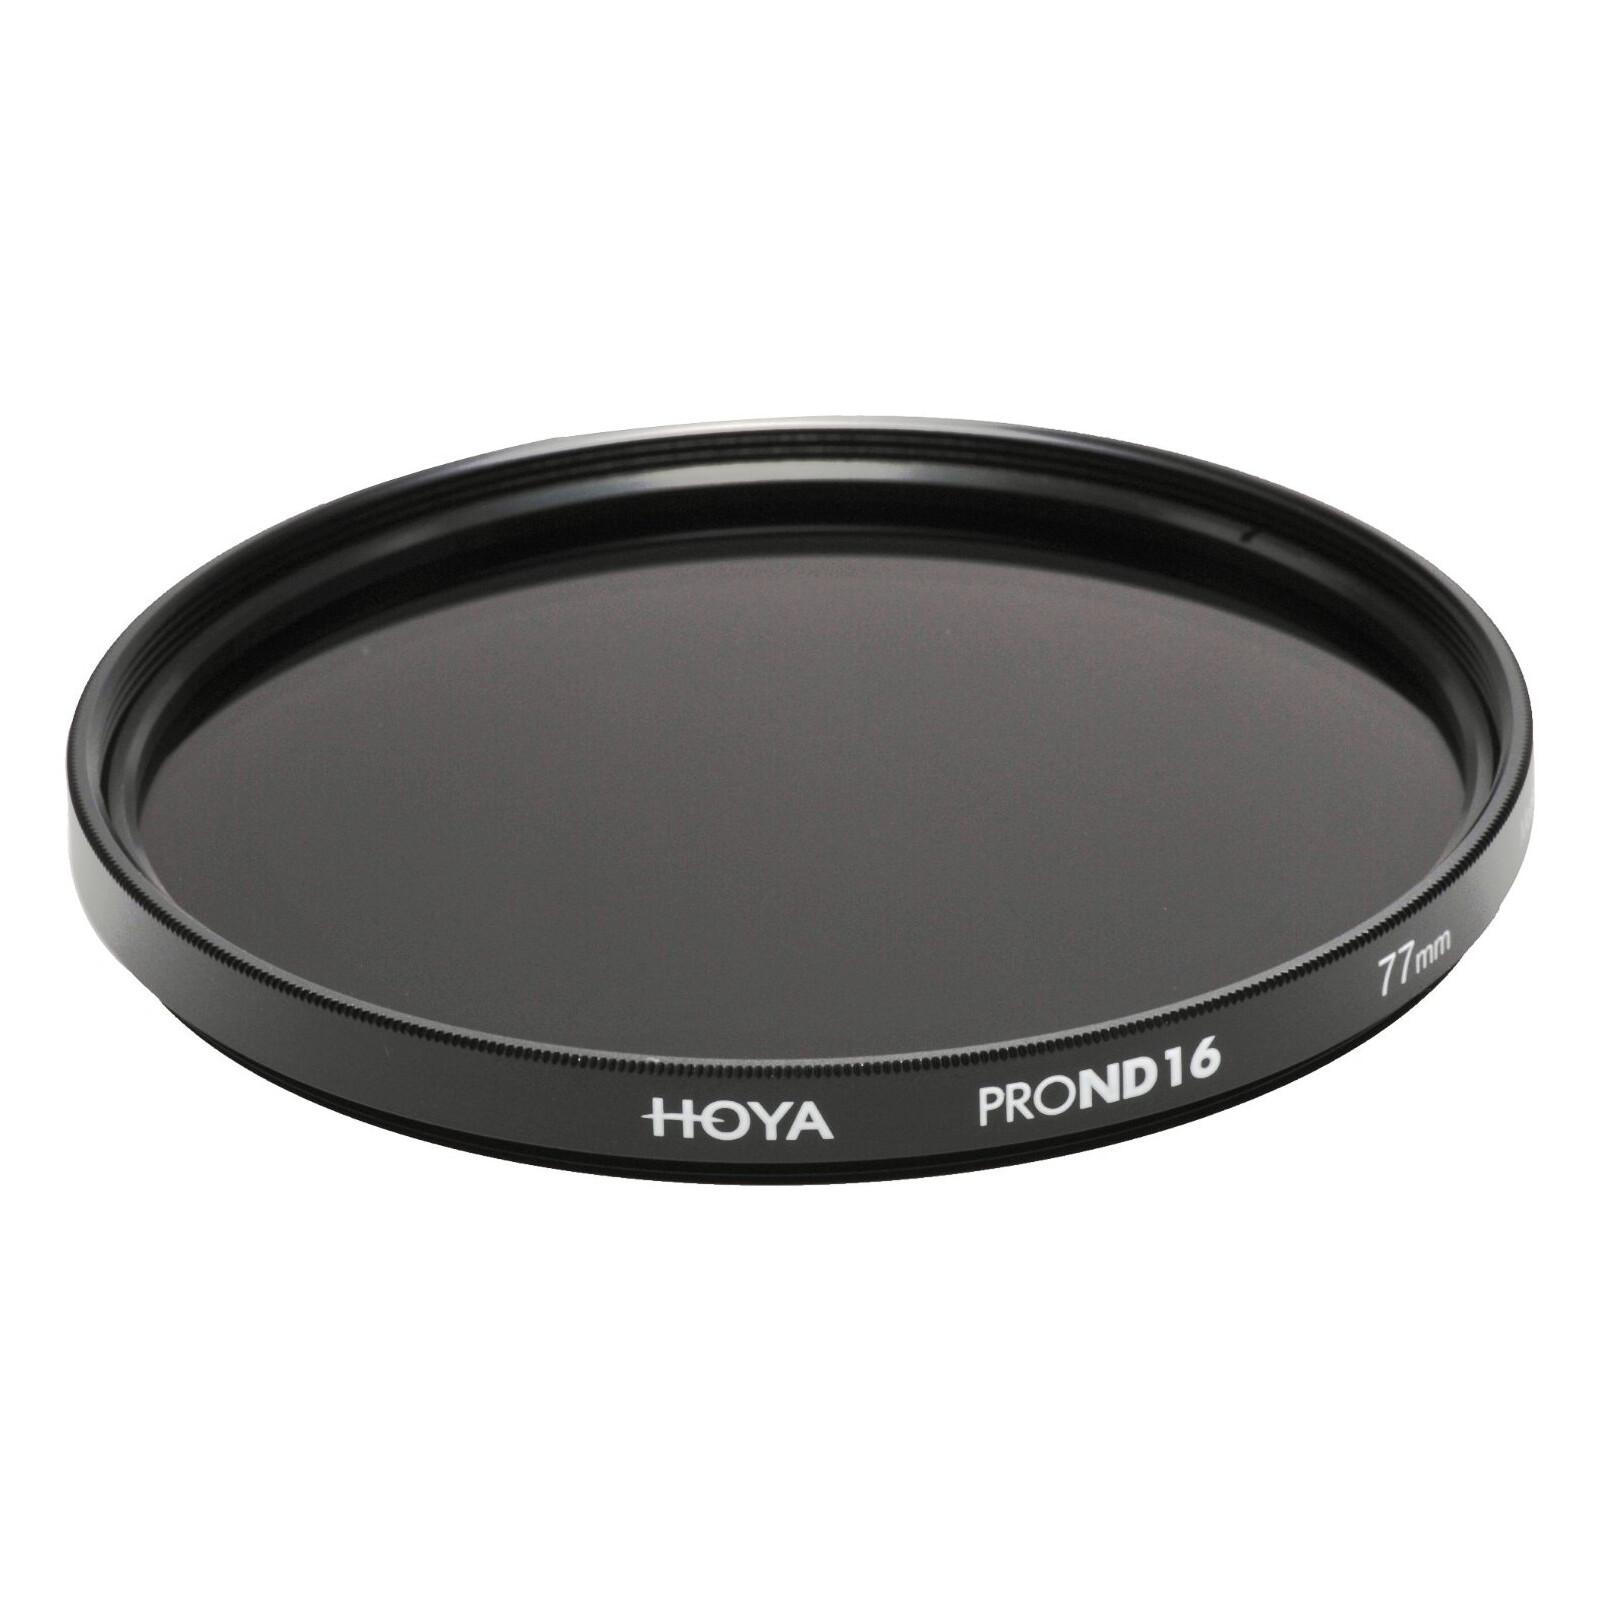 Hoya Grau PRO ND 16 55mm